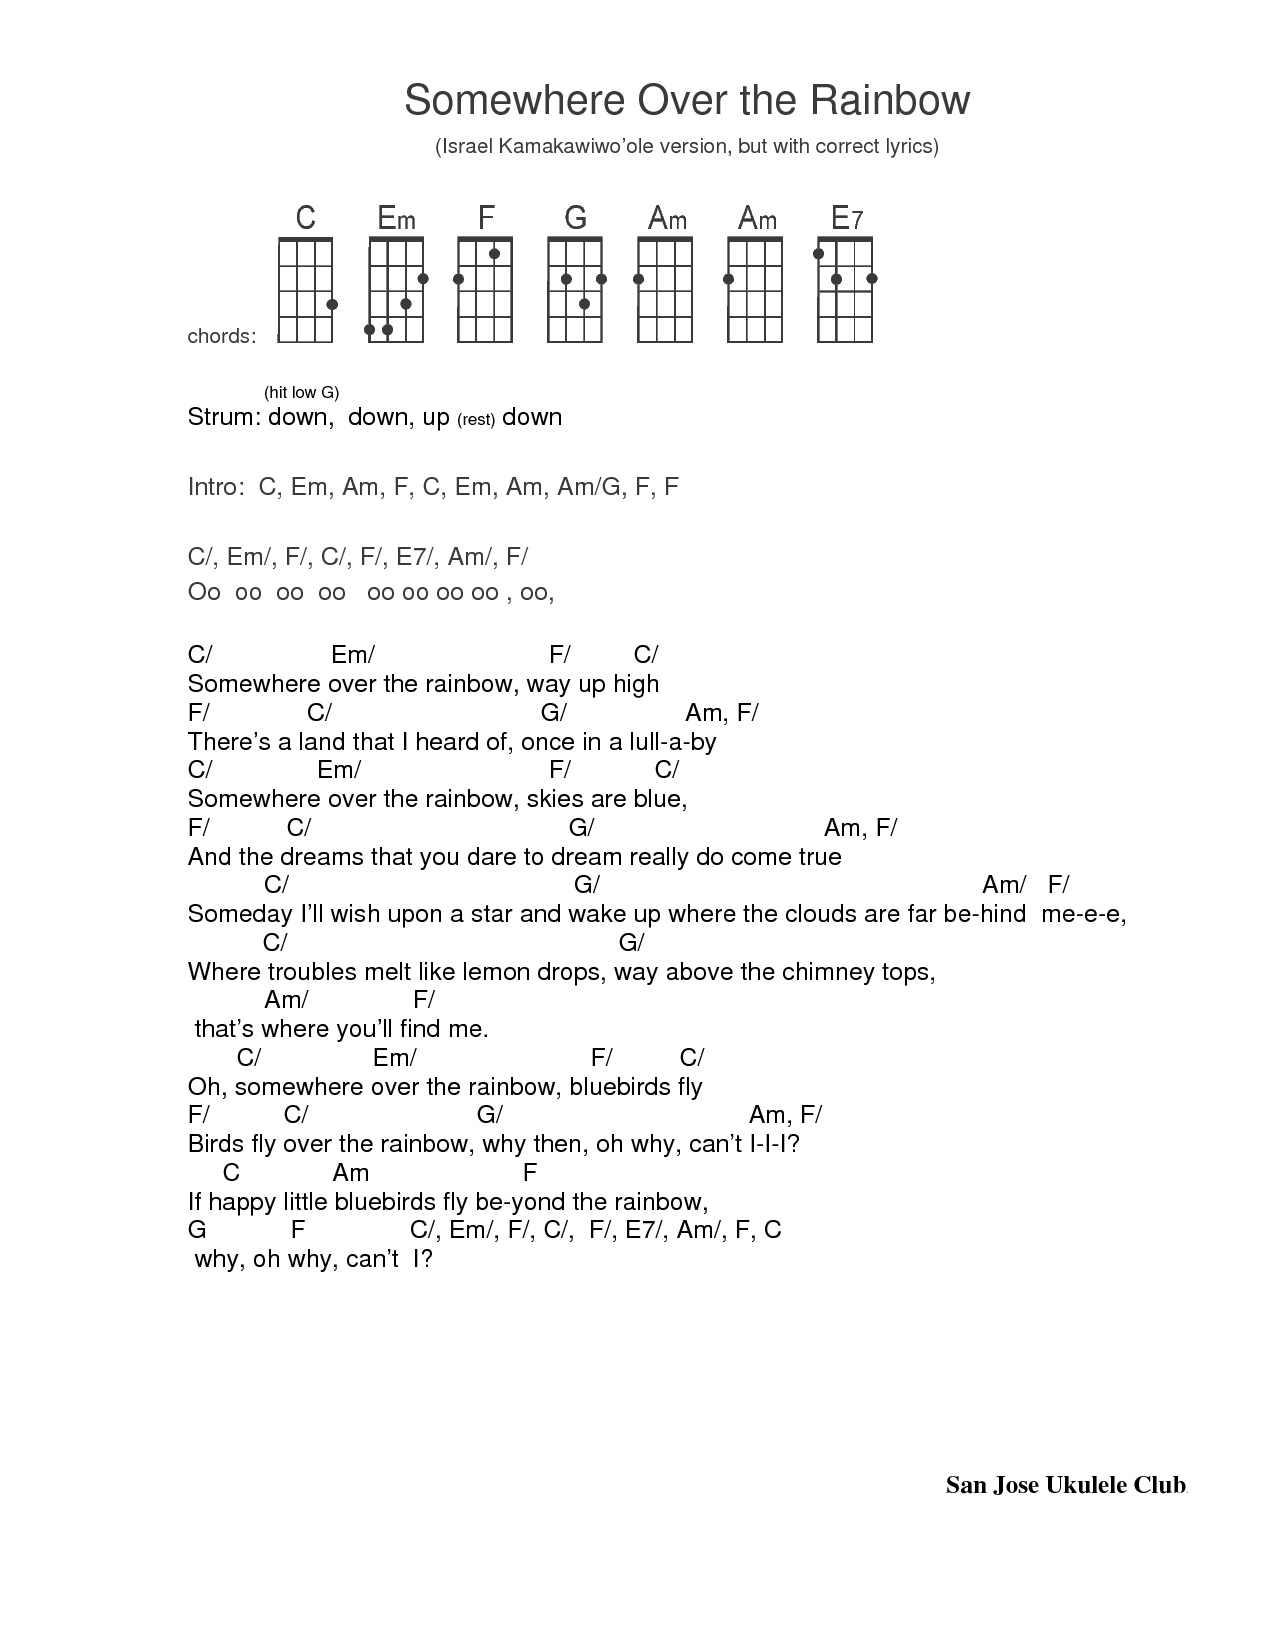 Easy ukulele chords for somewhere over the rainbow degli utenti somewhere over the rainbow ukulele chords sopranoeasy ukulele chords for somewhere over the rainbow hexwebz Gallery